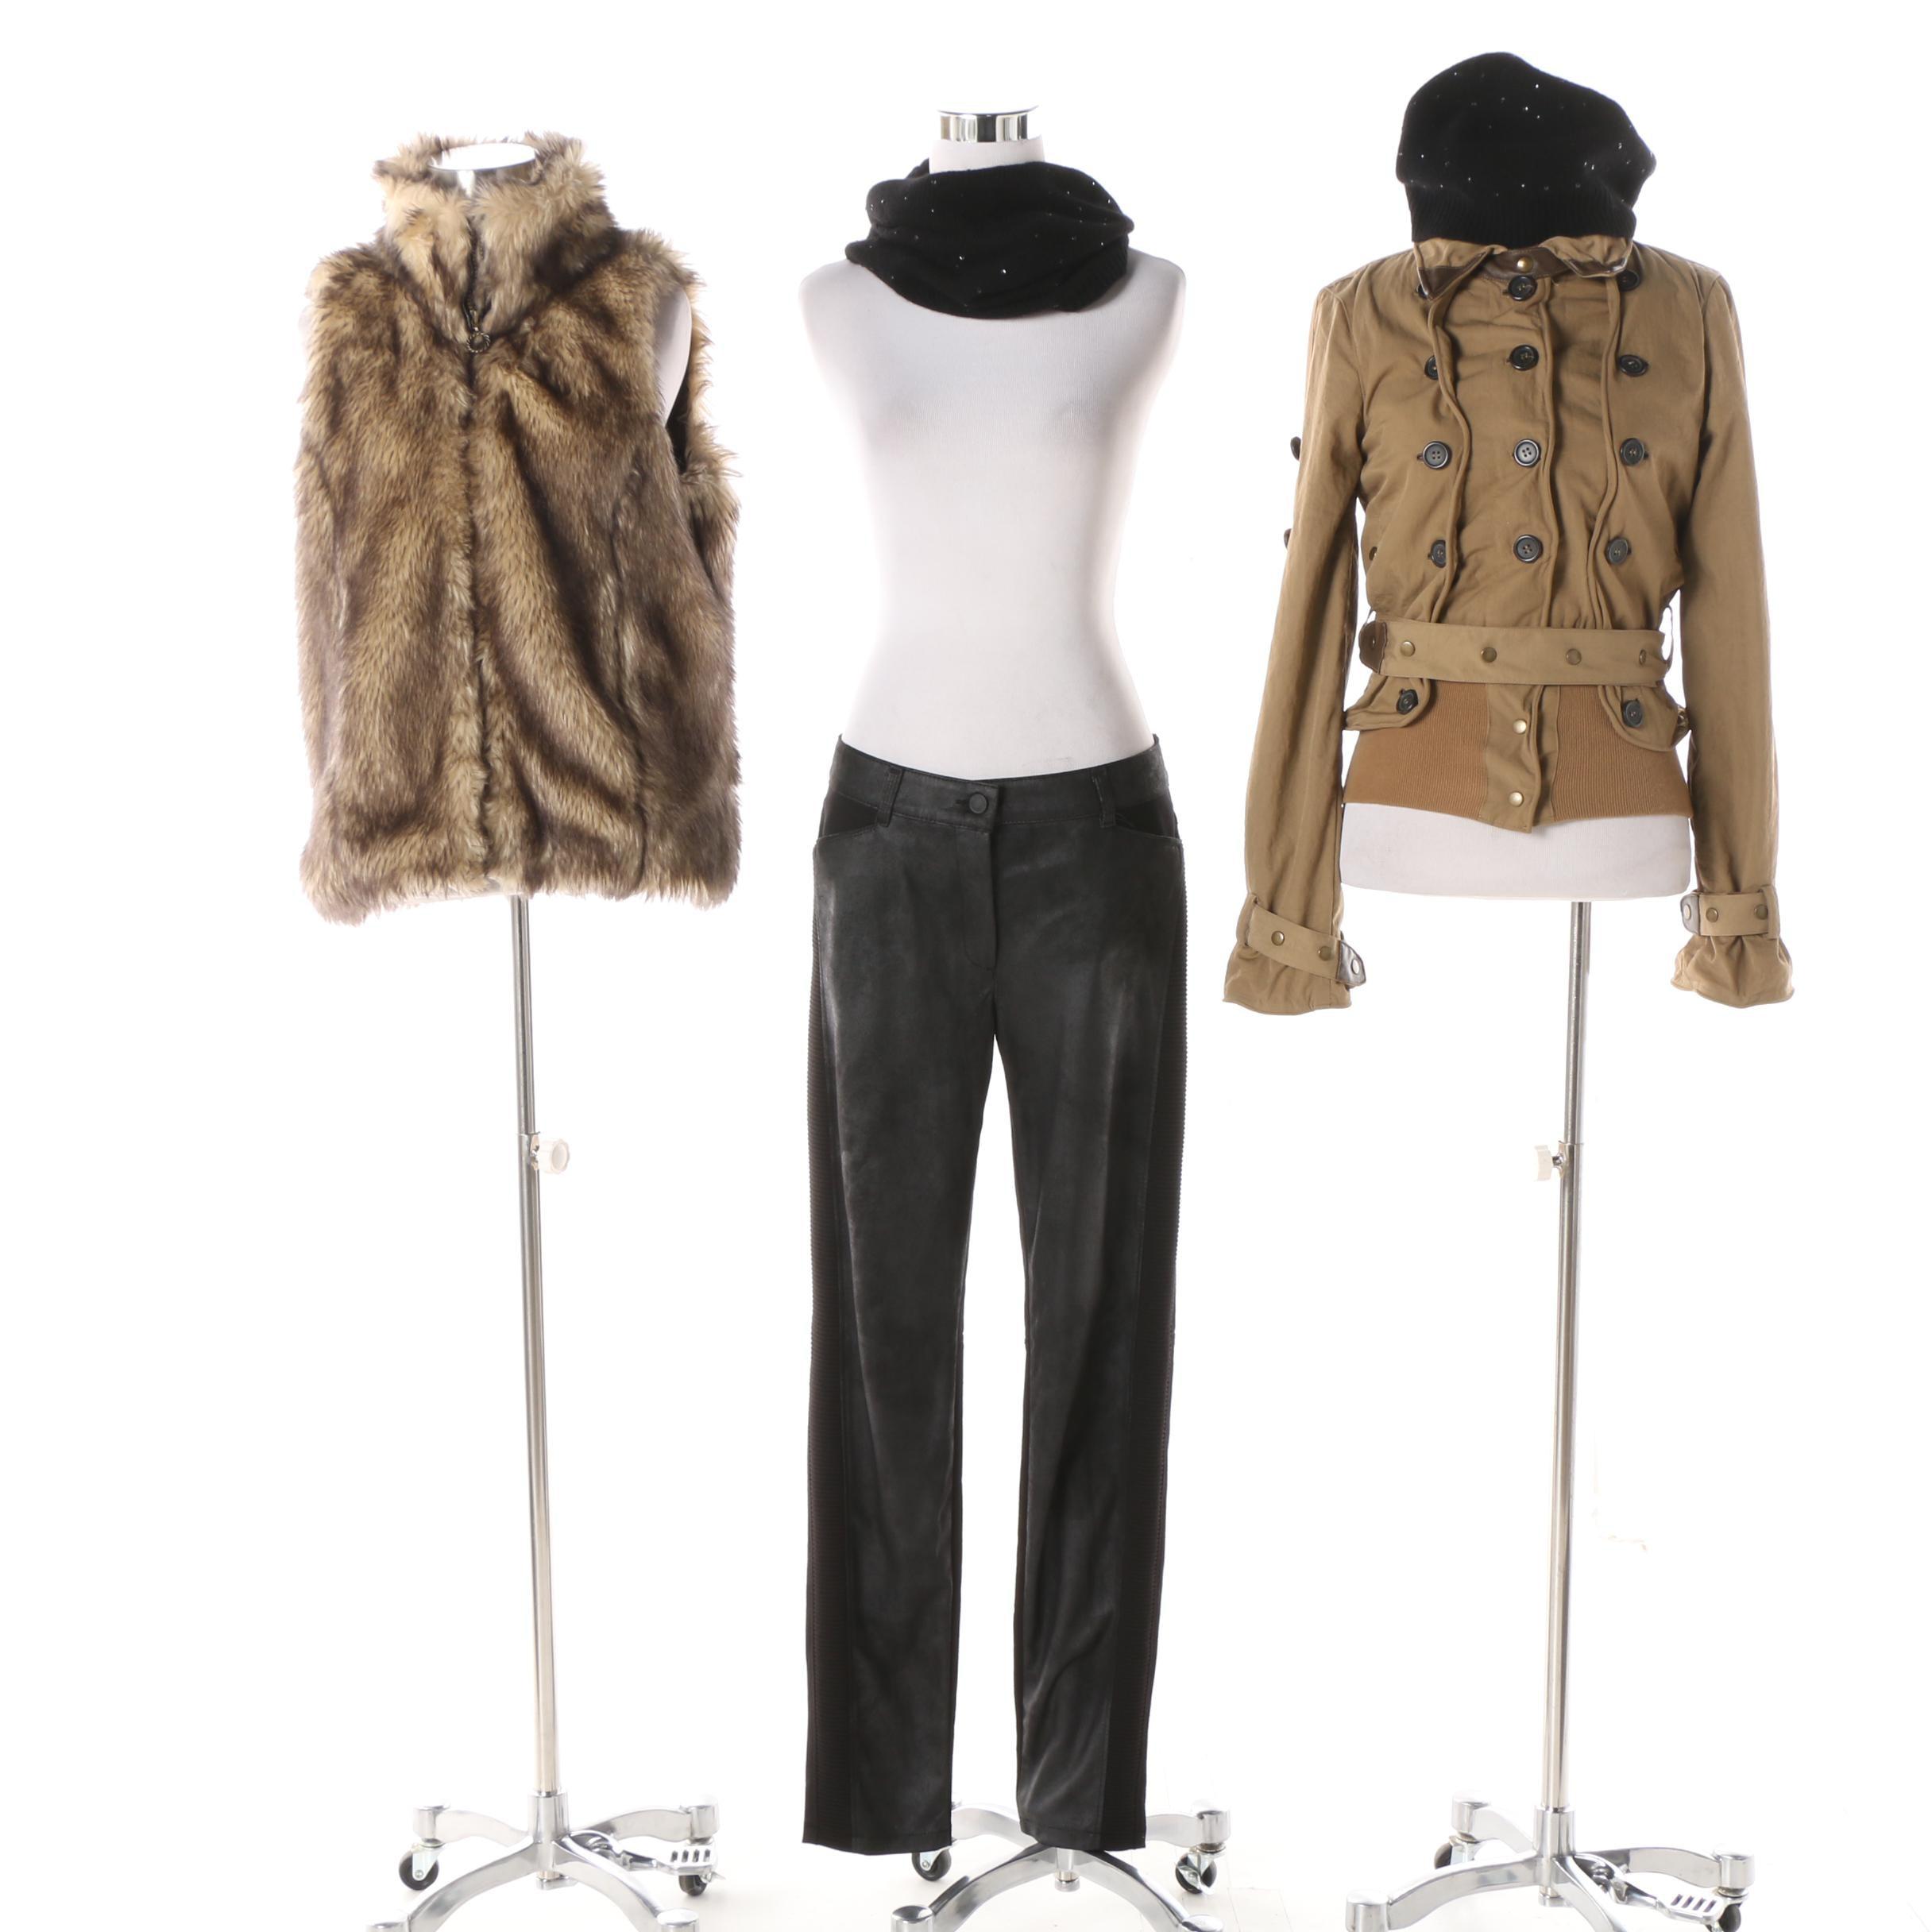 Women's Jacket, Vest, Pants and Hat Including Bianca and Nicholas K